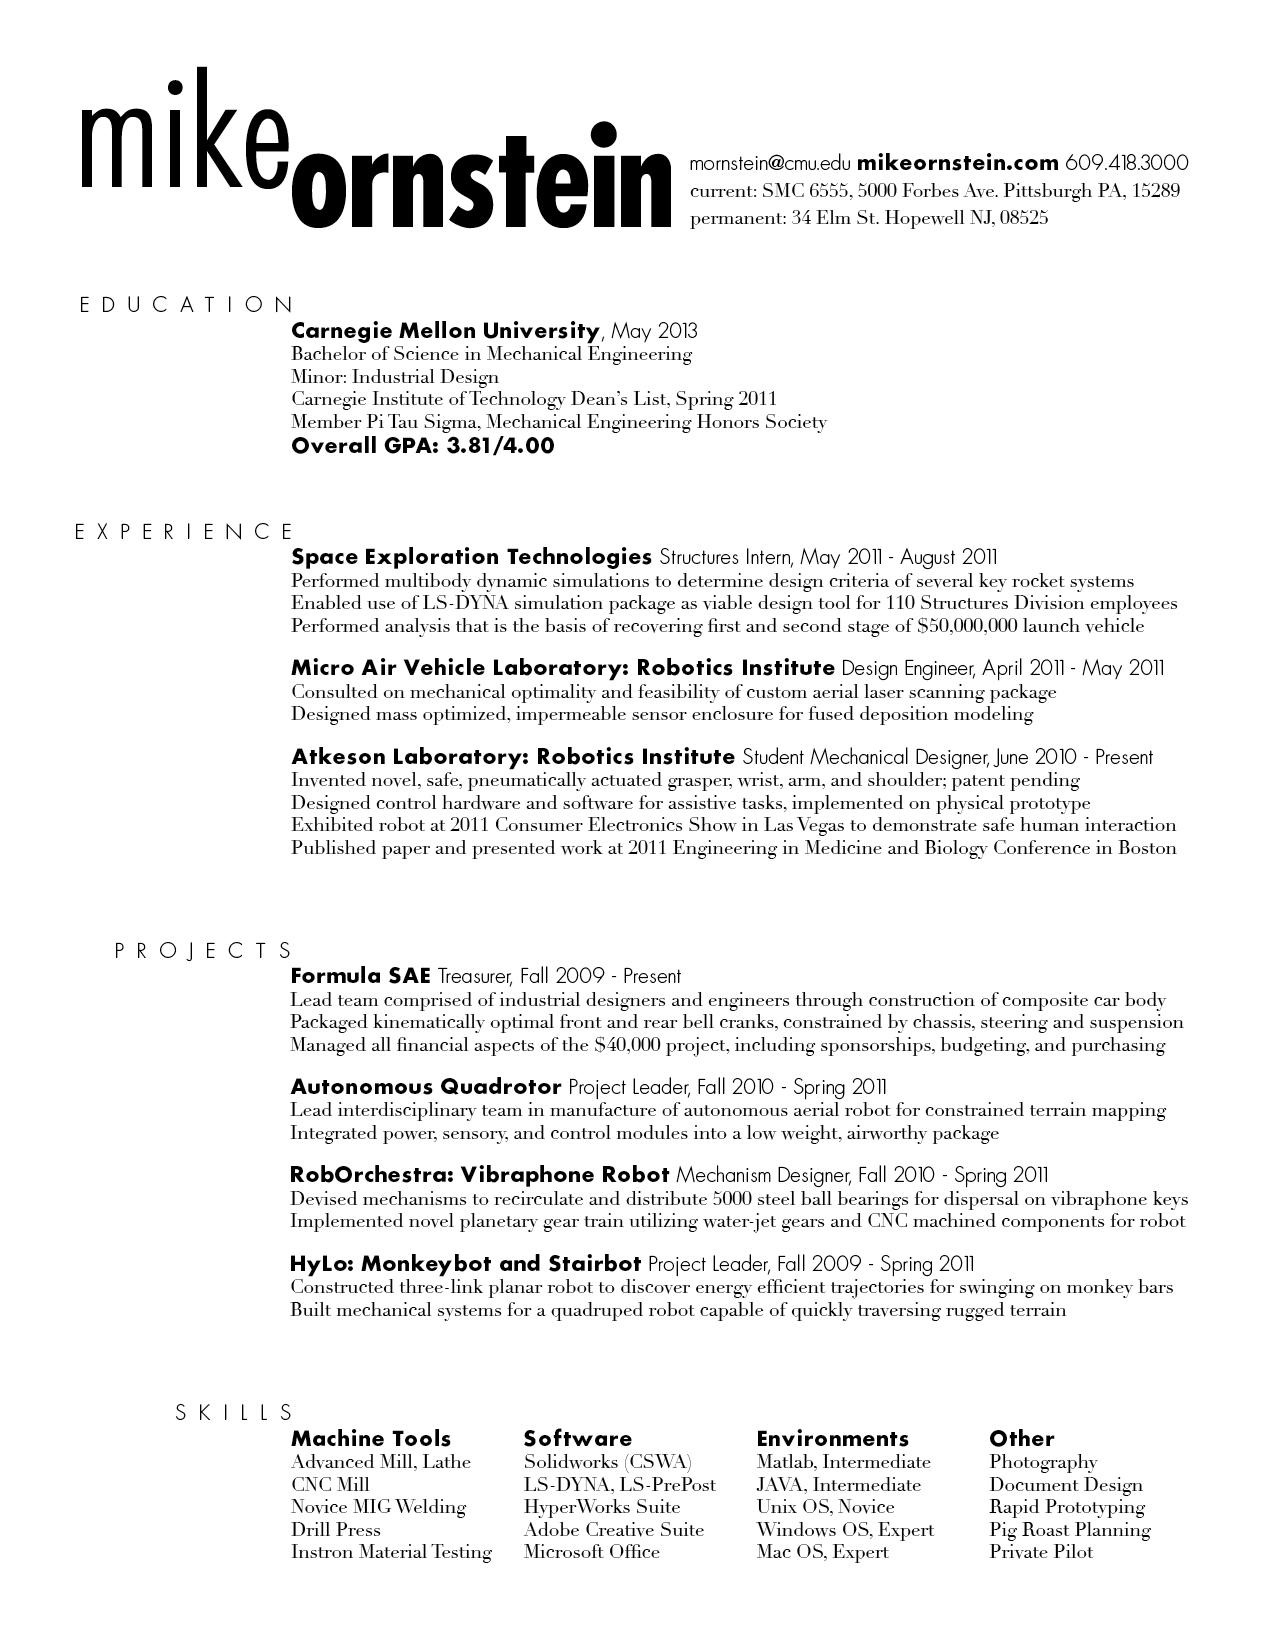 Sample Associate Cv Associate Cv Formats Templates Resume Rough Draft Mike Ornstein Cdf Fall 2011